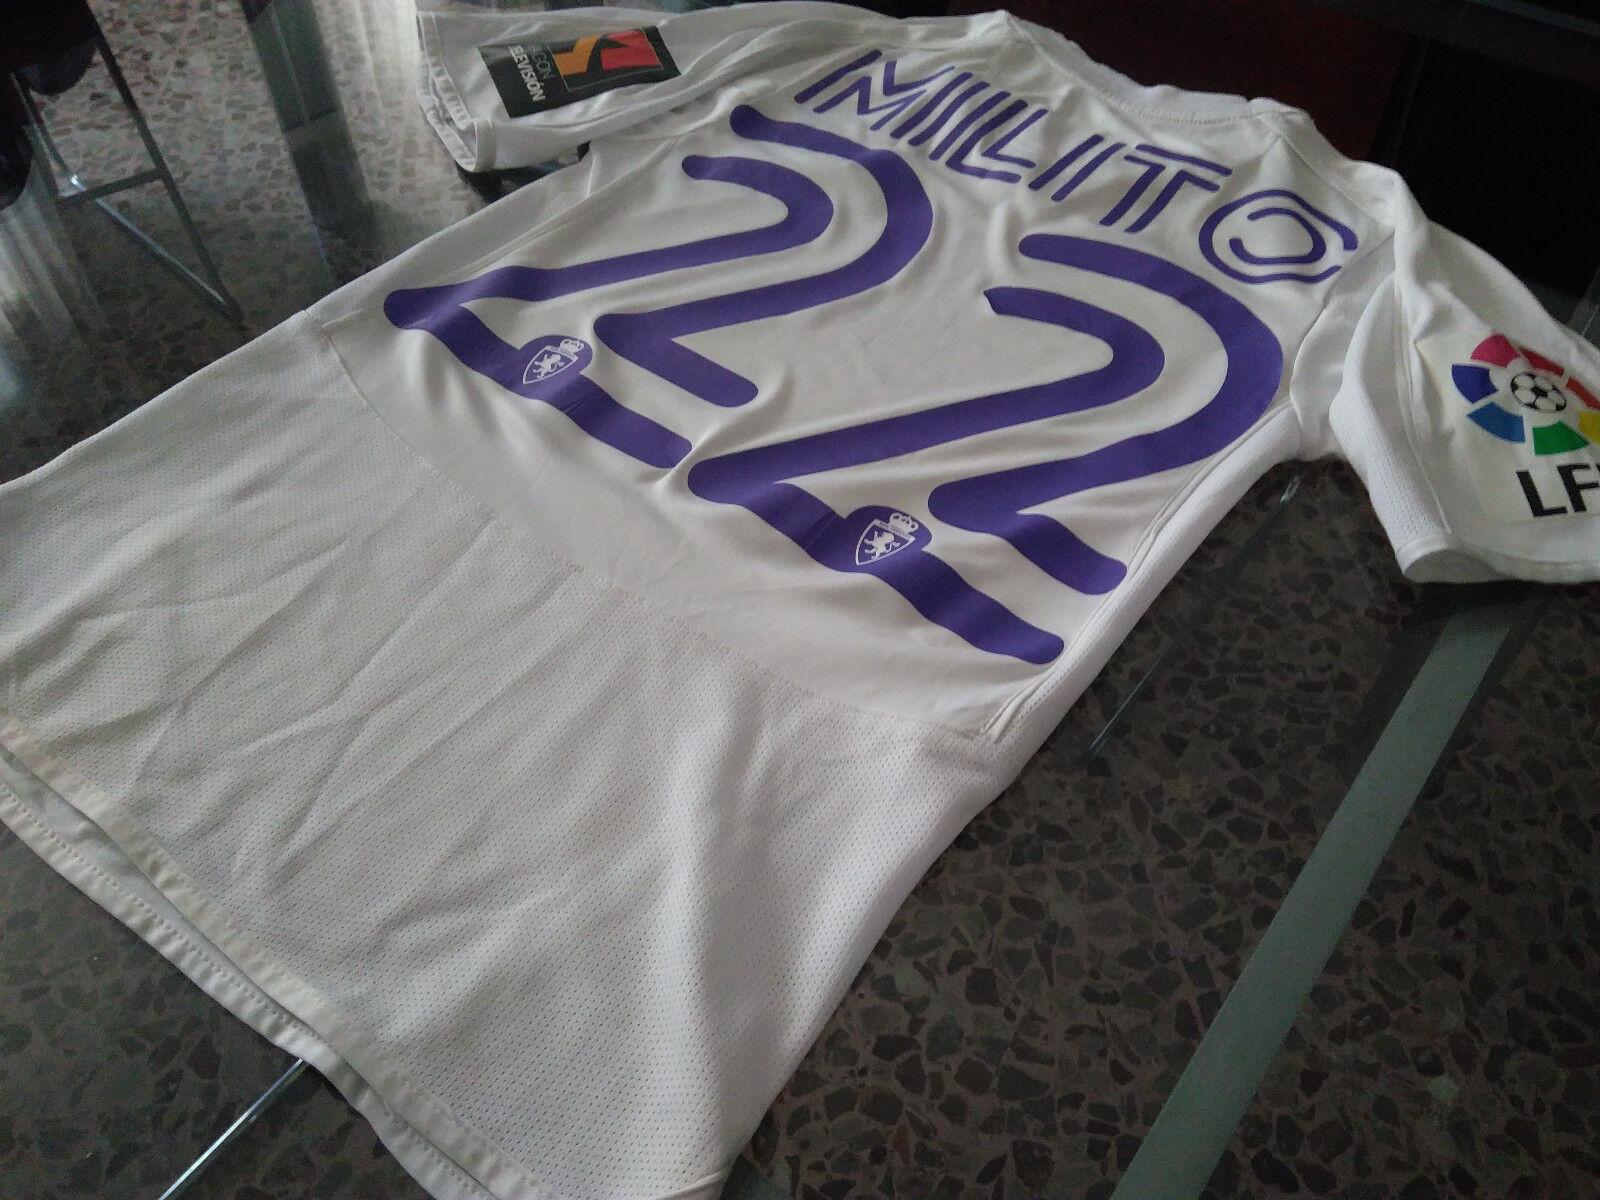 Maglia Diego Saragozza Milito  22 Real Saragozza Diego Zaragoza Shirt Trikot Jersey 2007-08 1724fb